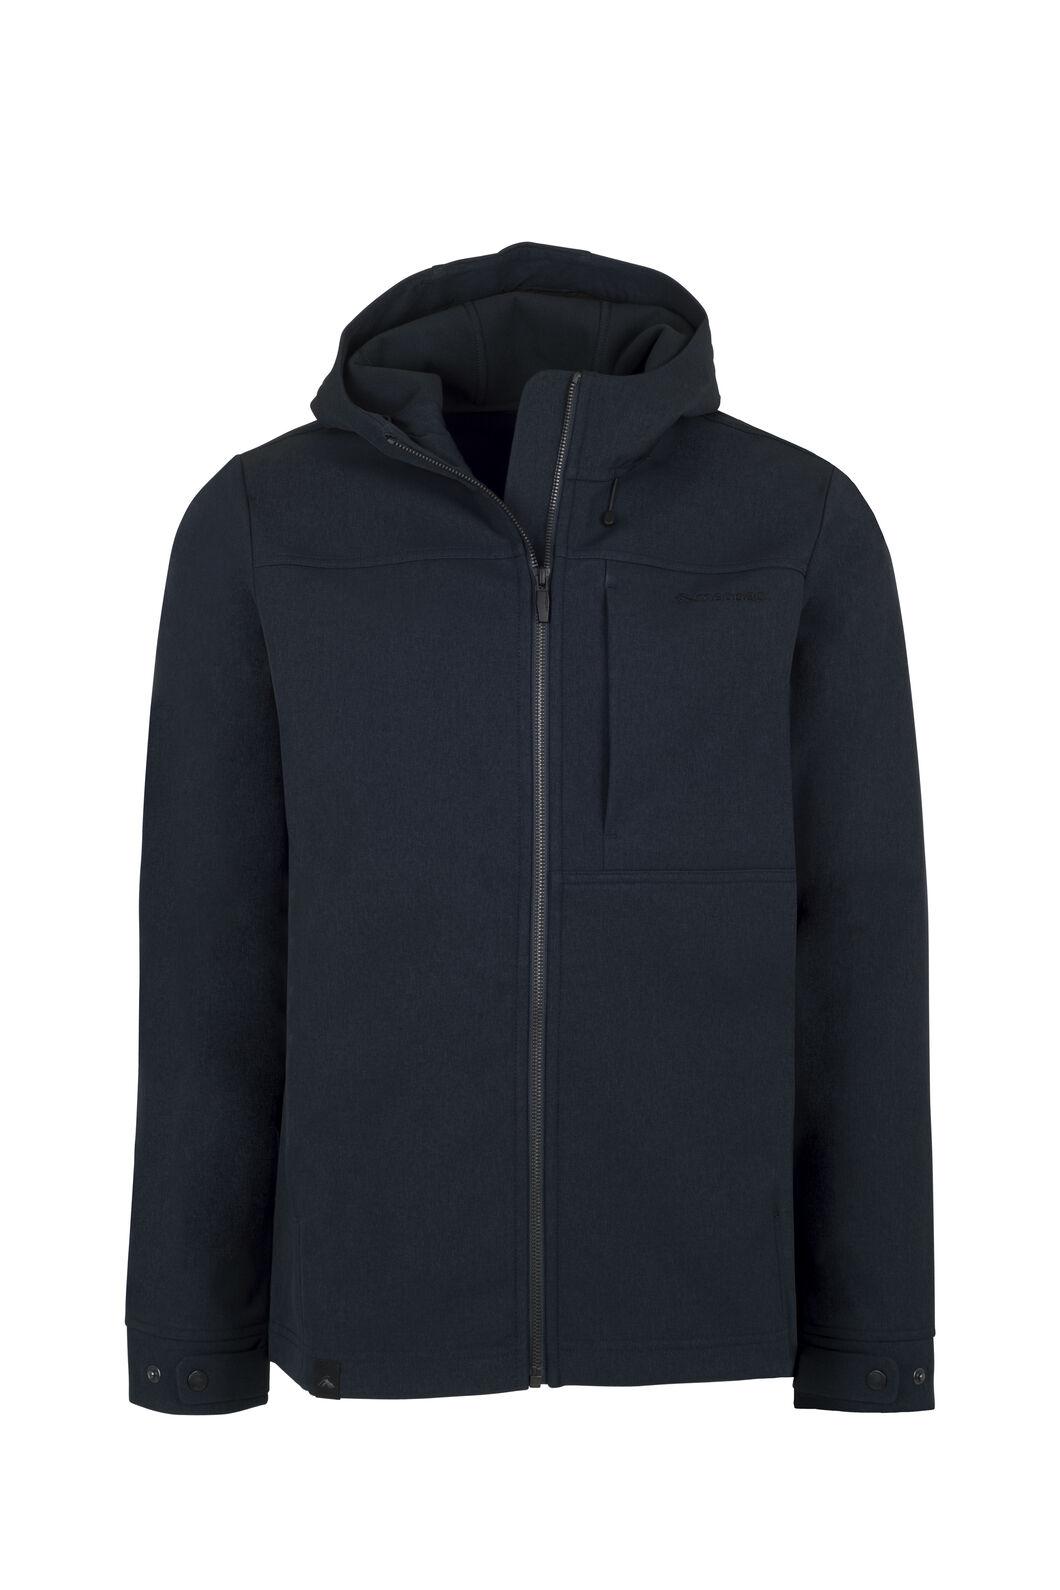 Macpac Chord Hooded Softshell Jacket - Men's, Carbon, hi-res